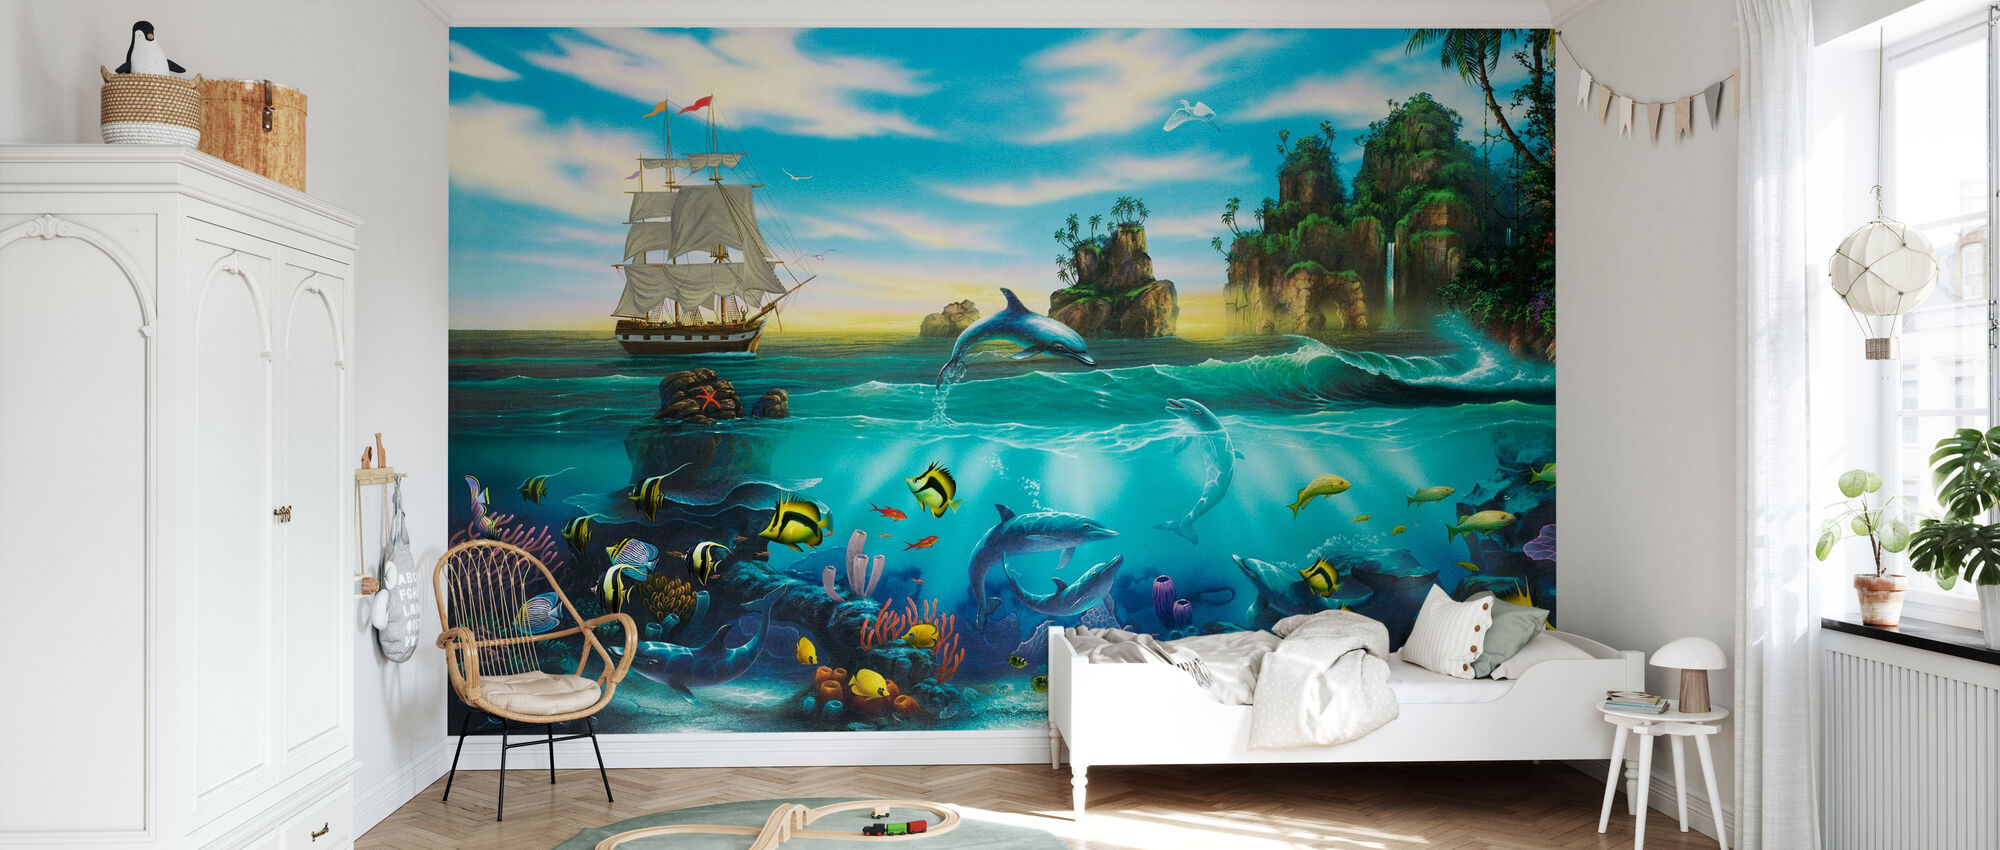 Paradise Found - Wallpaper - Kids Room